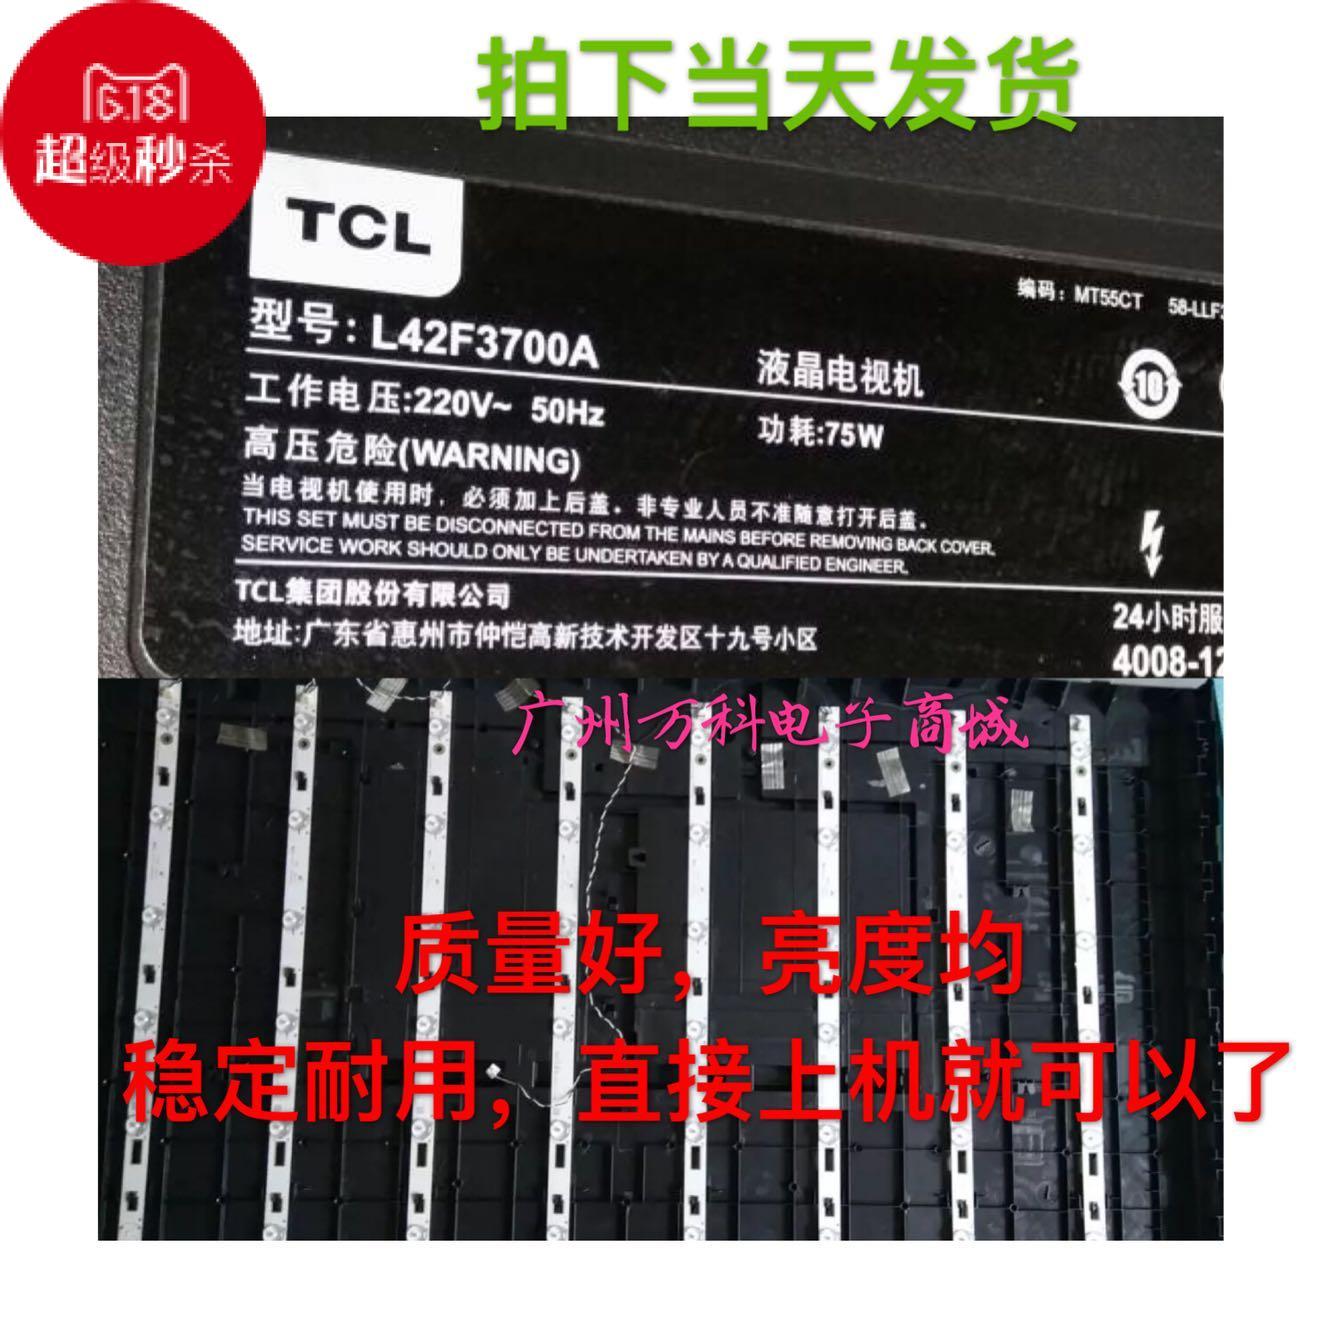 TCL L42F3700A灯条4C-LB4206-YH4 006-P2K2123A屏LVF420NDAL一套